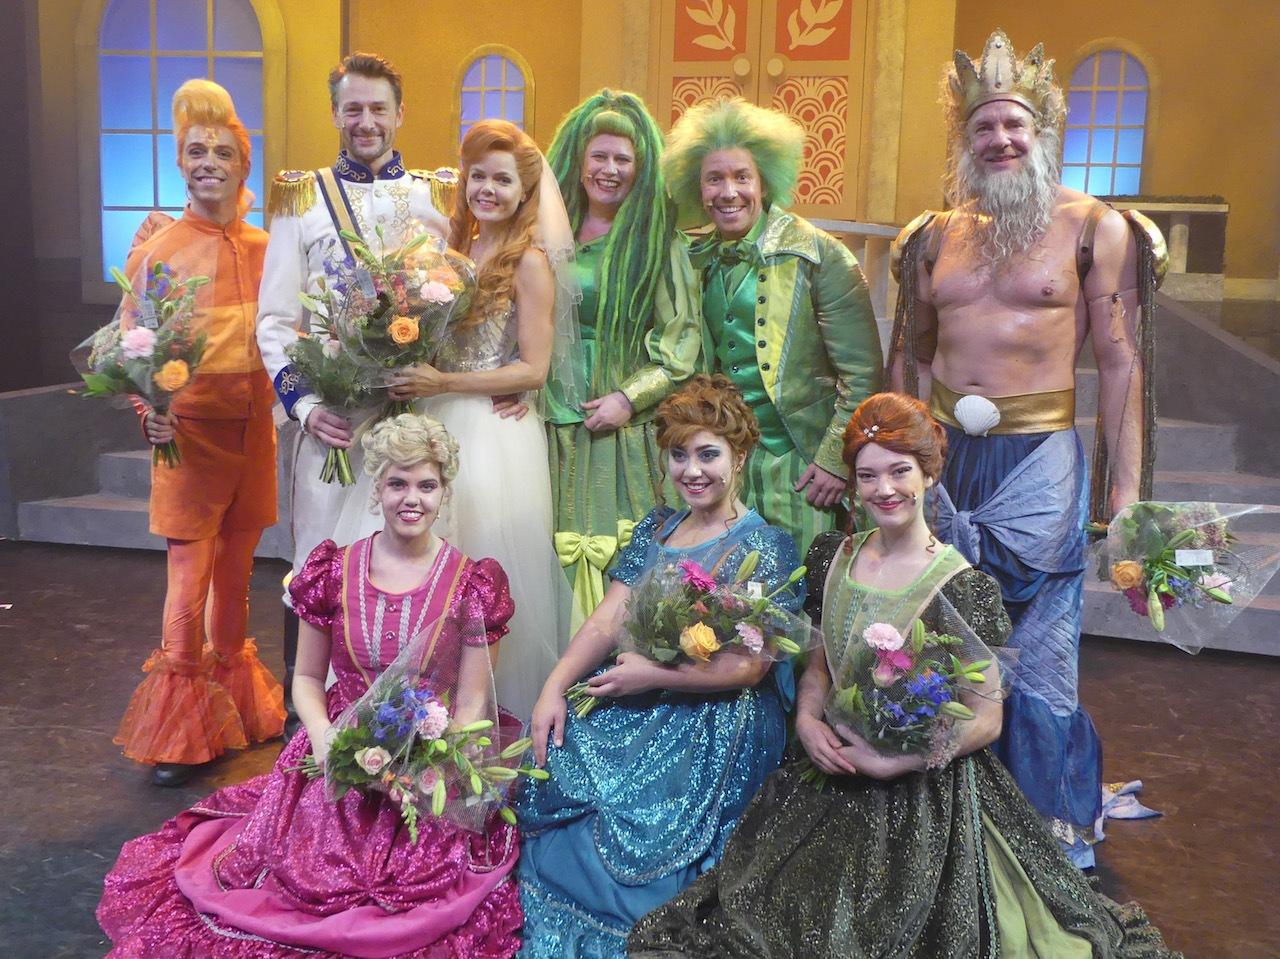 'De Kleine Zeemeermin De Musical' succesvol in première